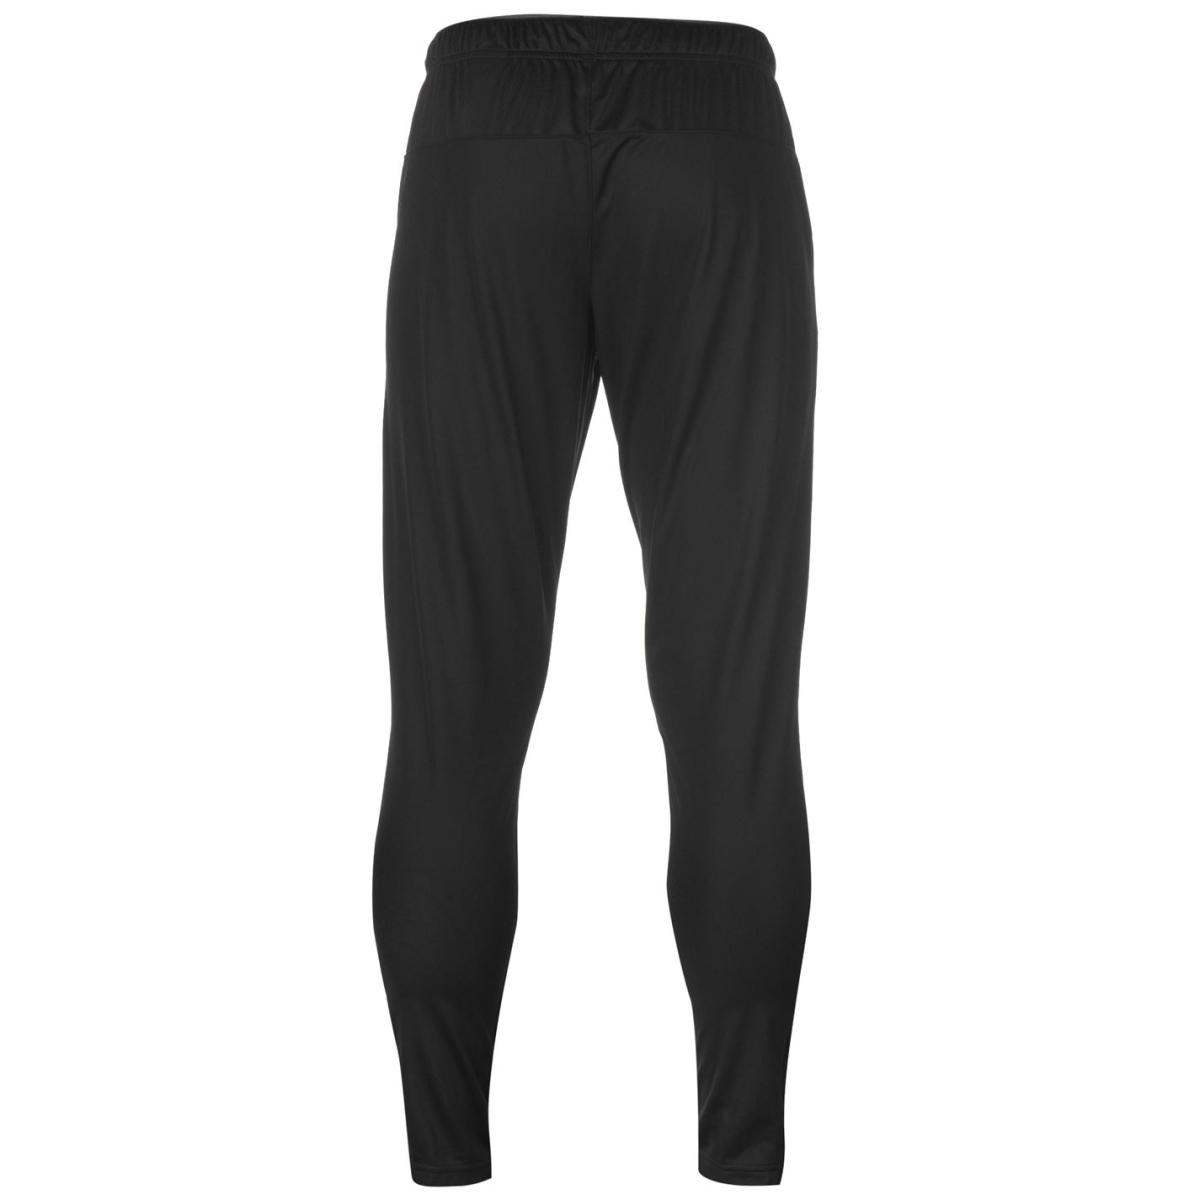 Reebok Trainingshose Herren Jogginghose Sporthose Jogger Fitness 0070